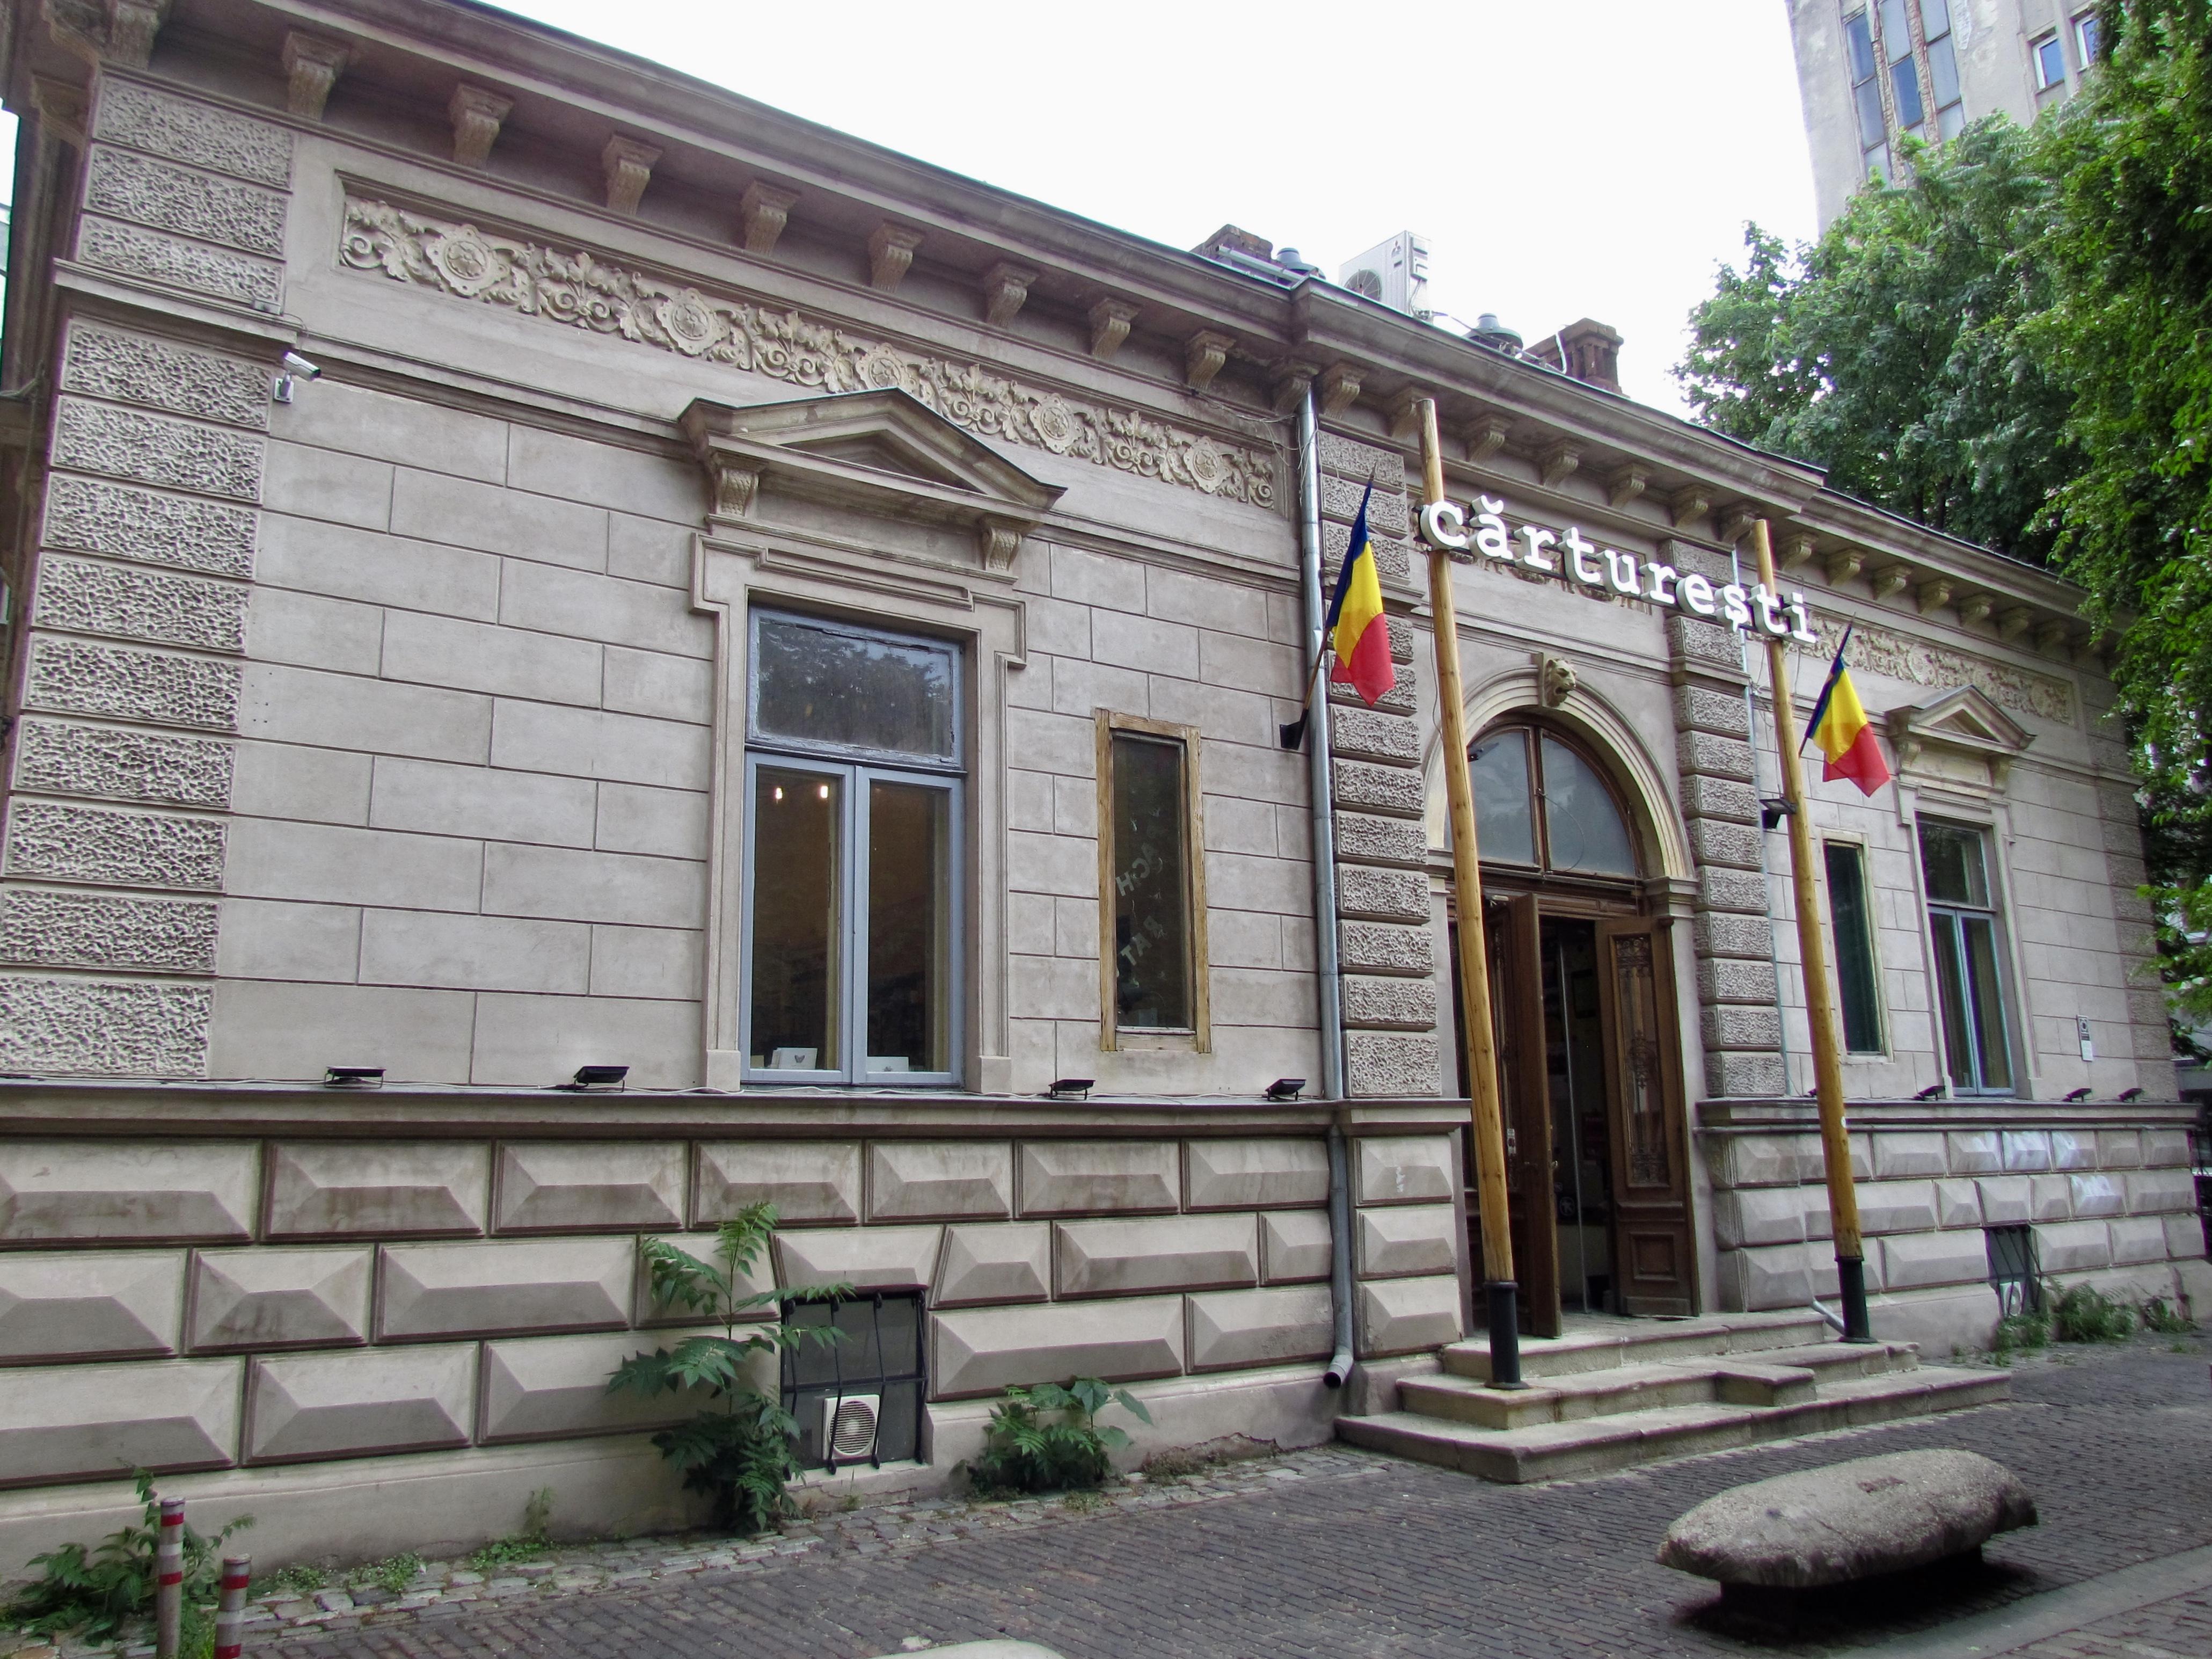 Carturesti Bookstore on Strada Pictor Arthur Verona 13-15, Bucharest